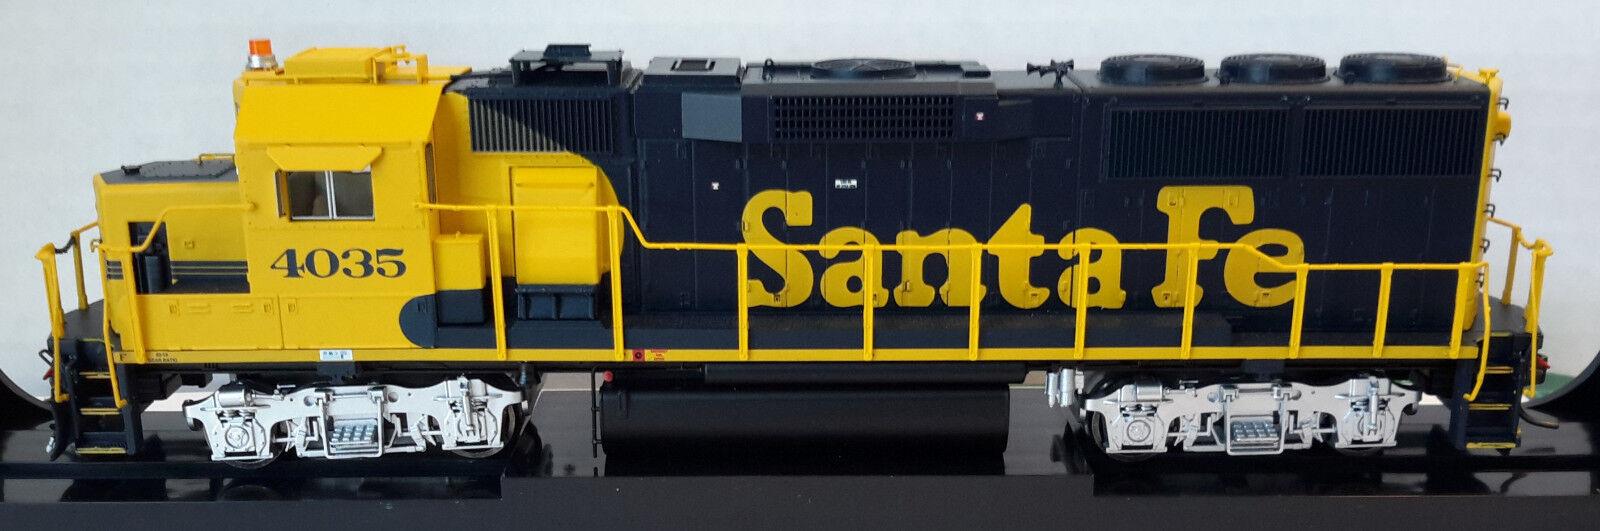 HO Scale Fox Valley Models GP60 'Santa Fe' DCC Ready Item  20253